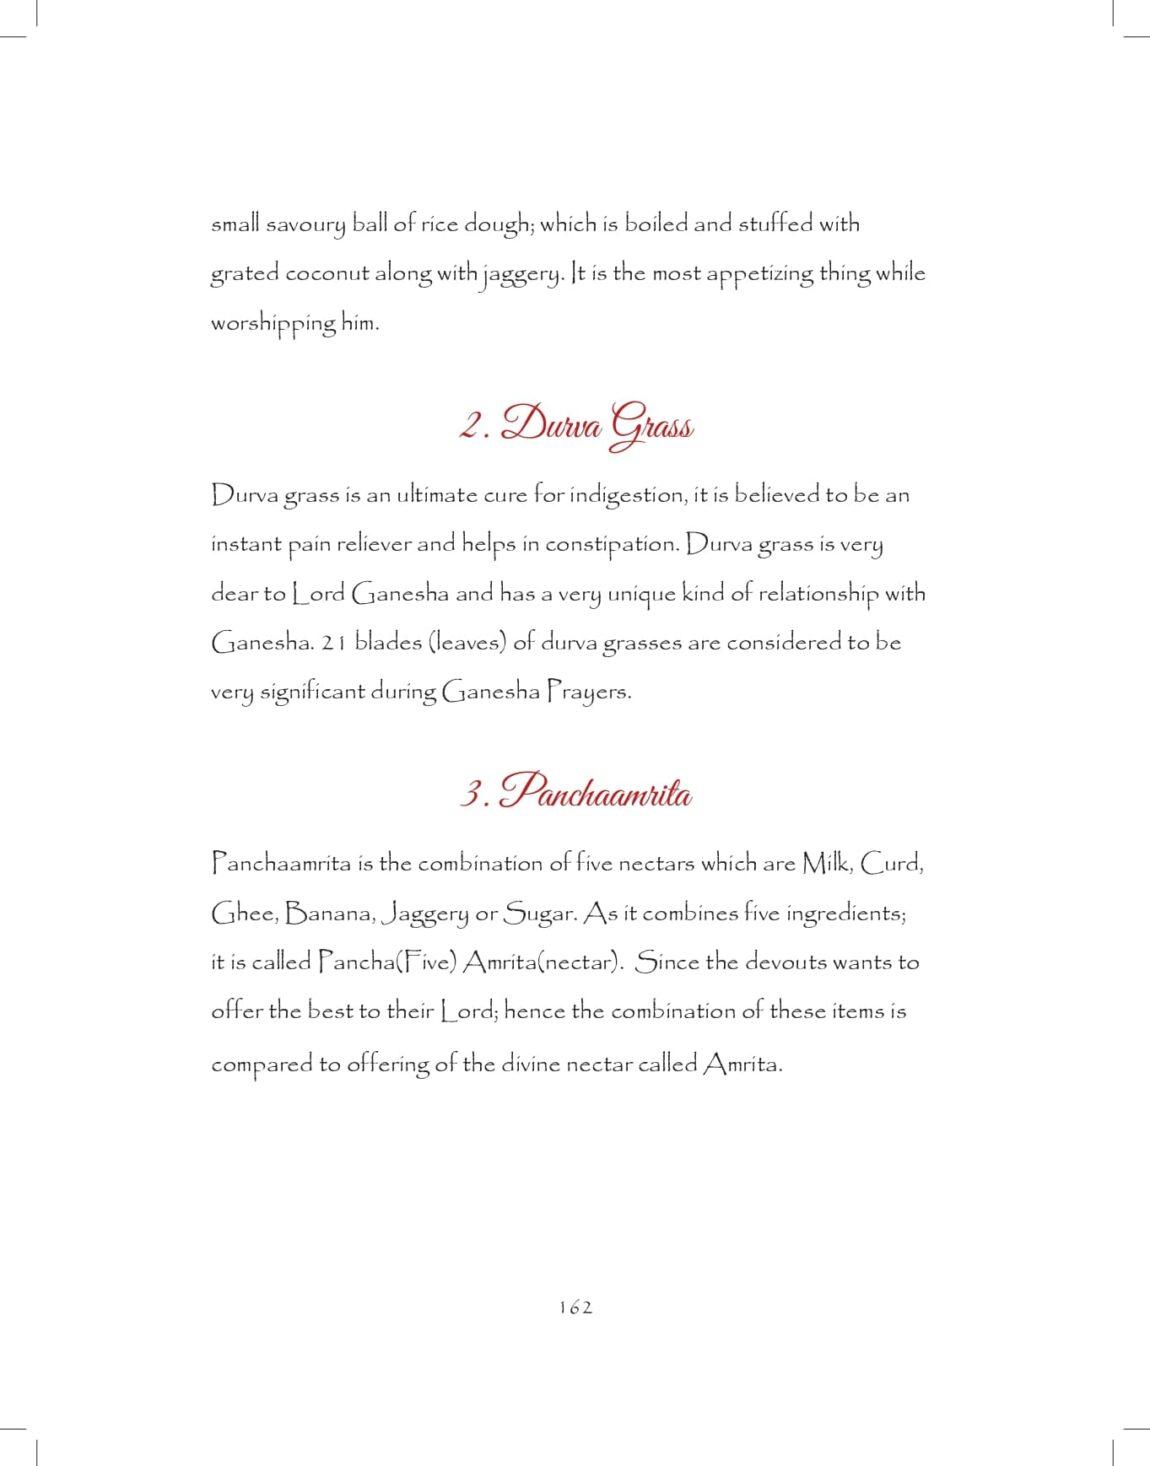 Ganesh-print_pages-to-jpg-0162.jpg